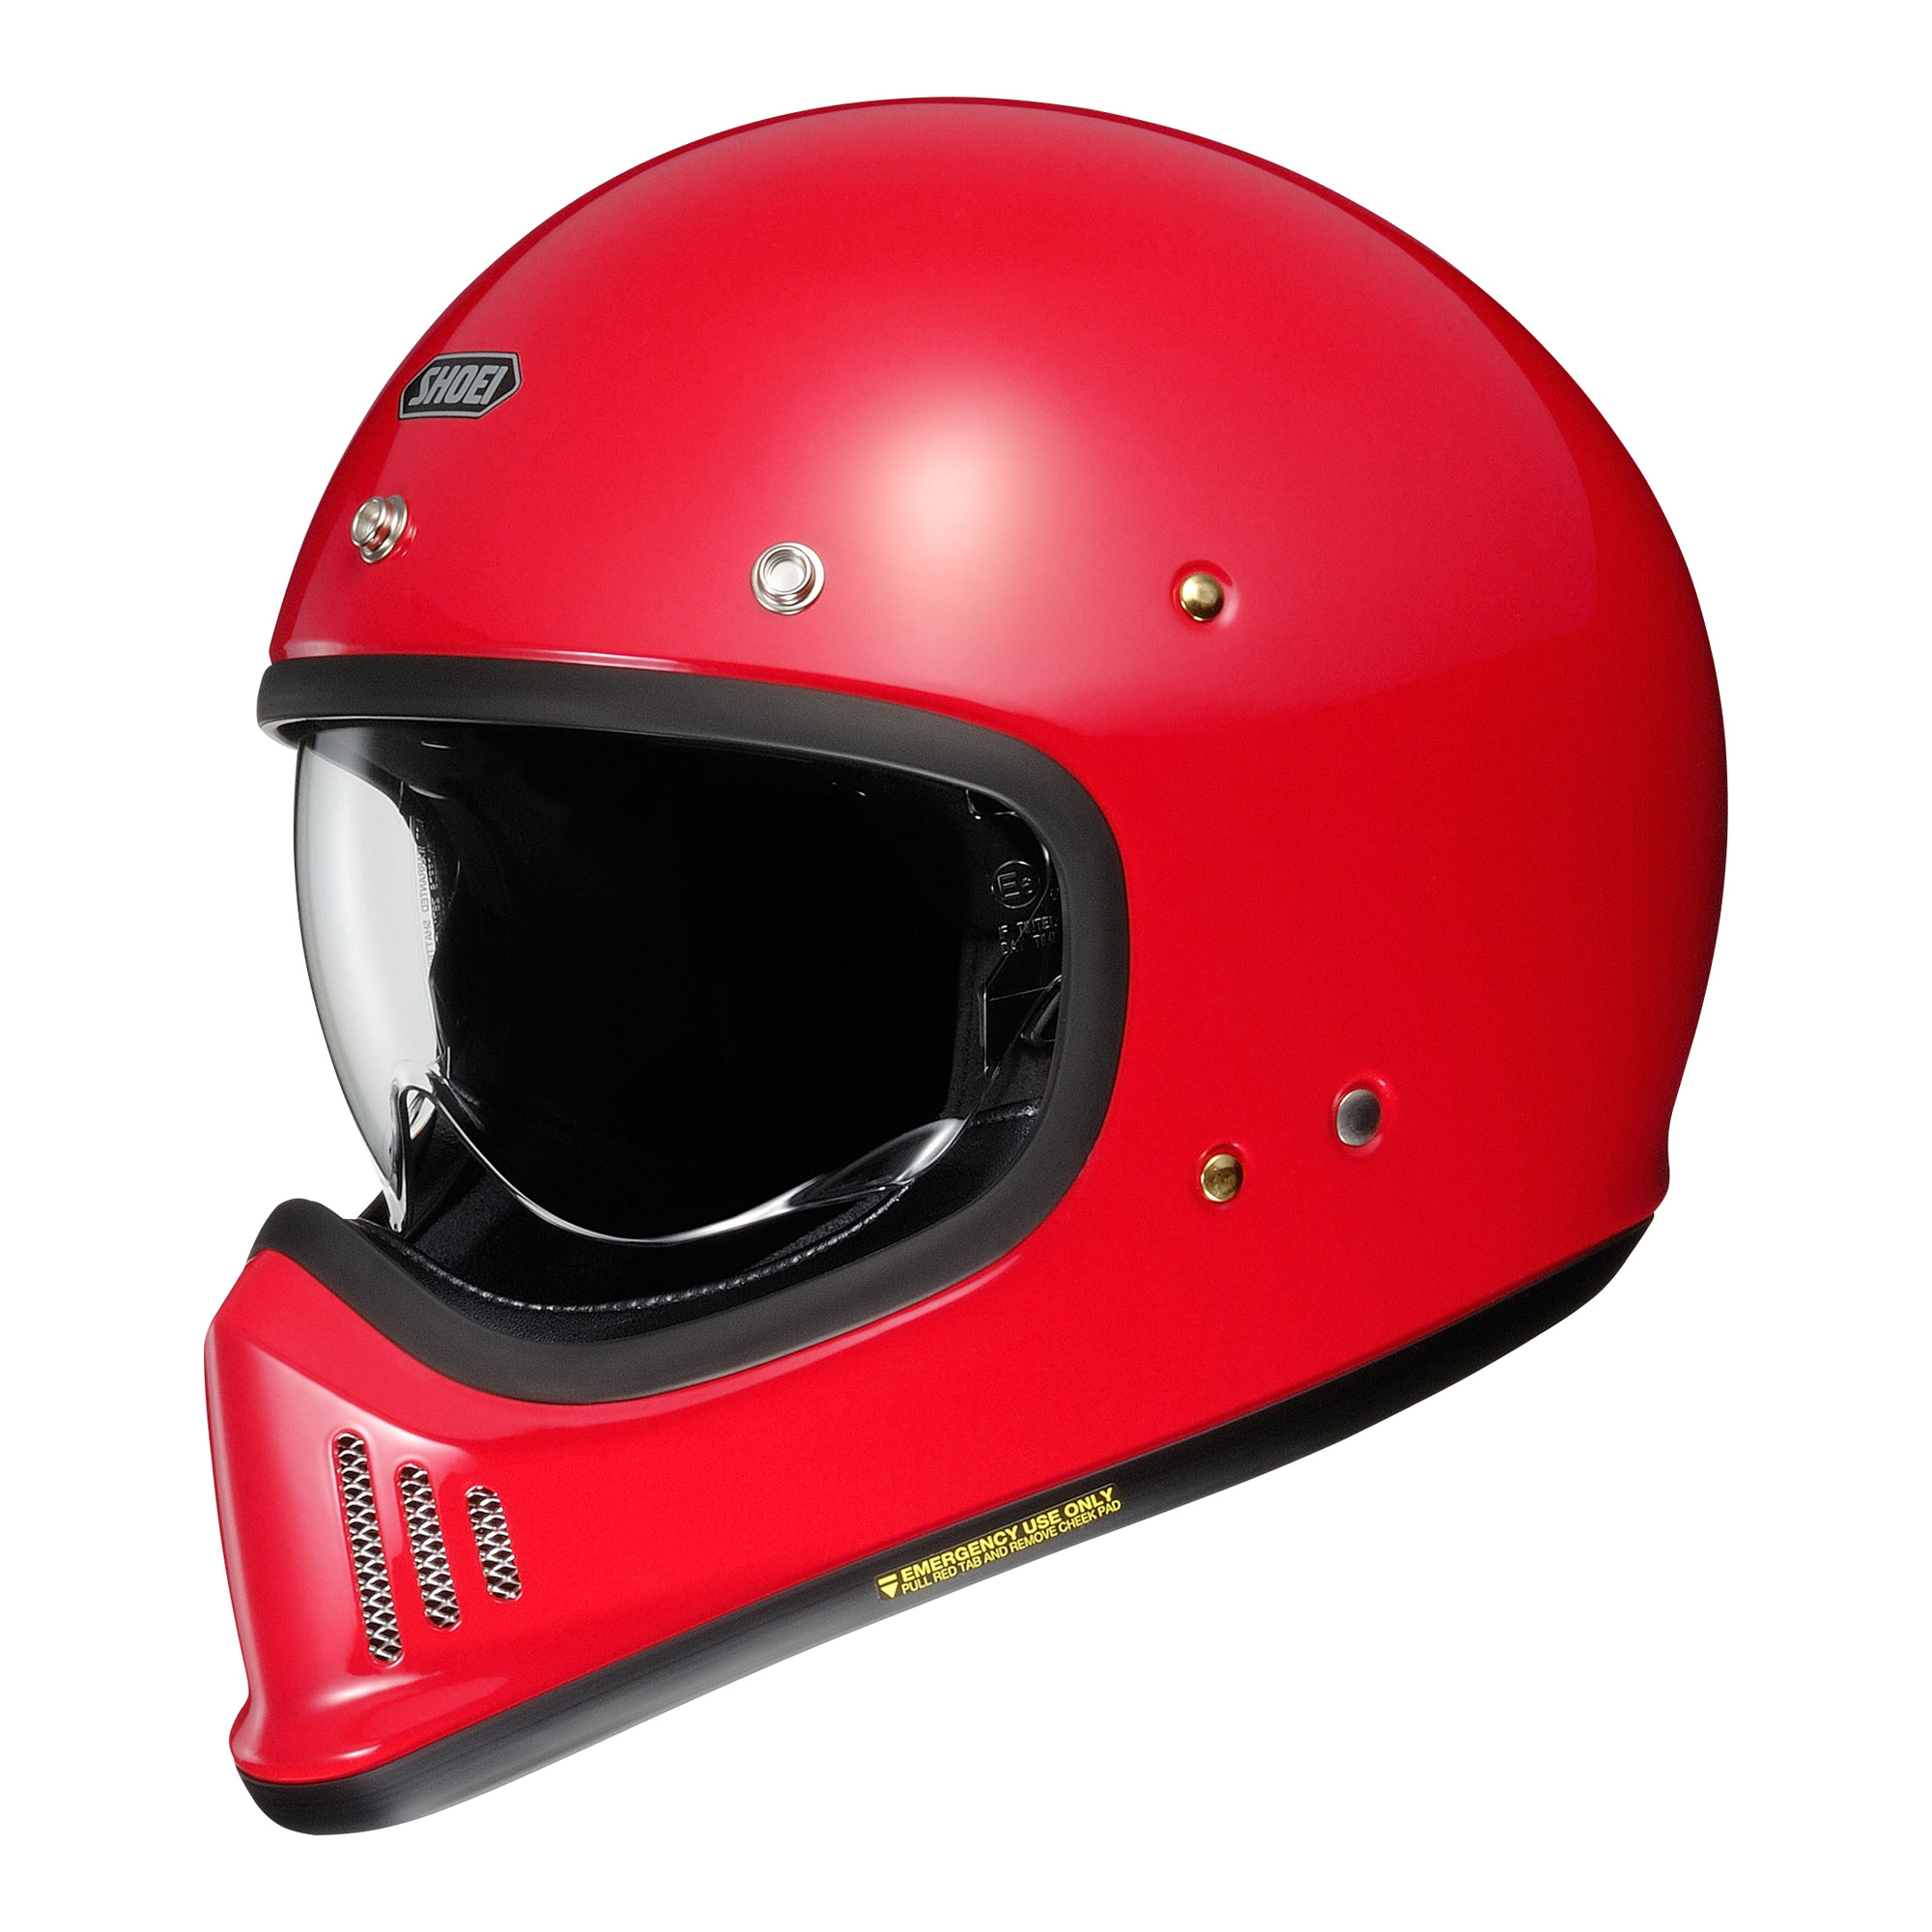 Shoei EX-Zero shine red